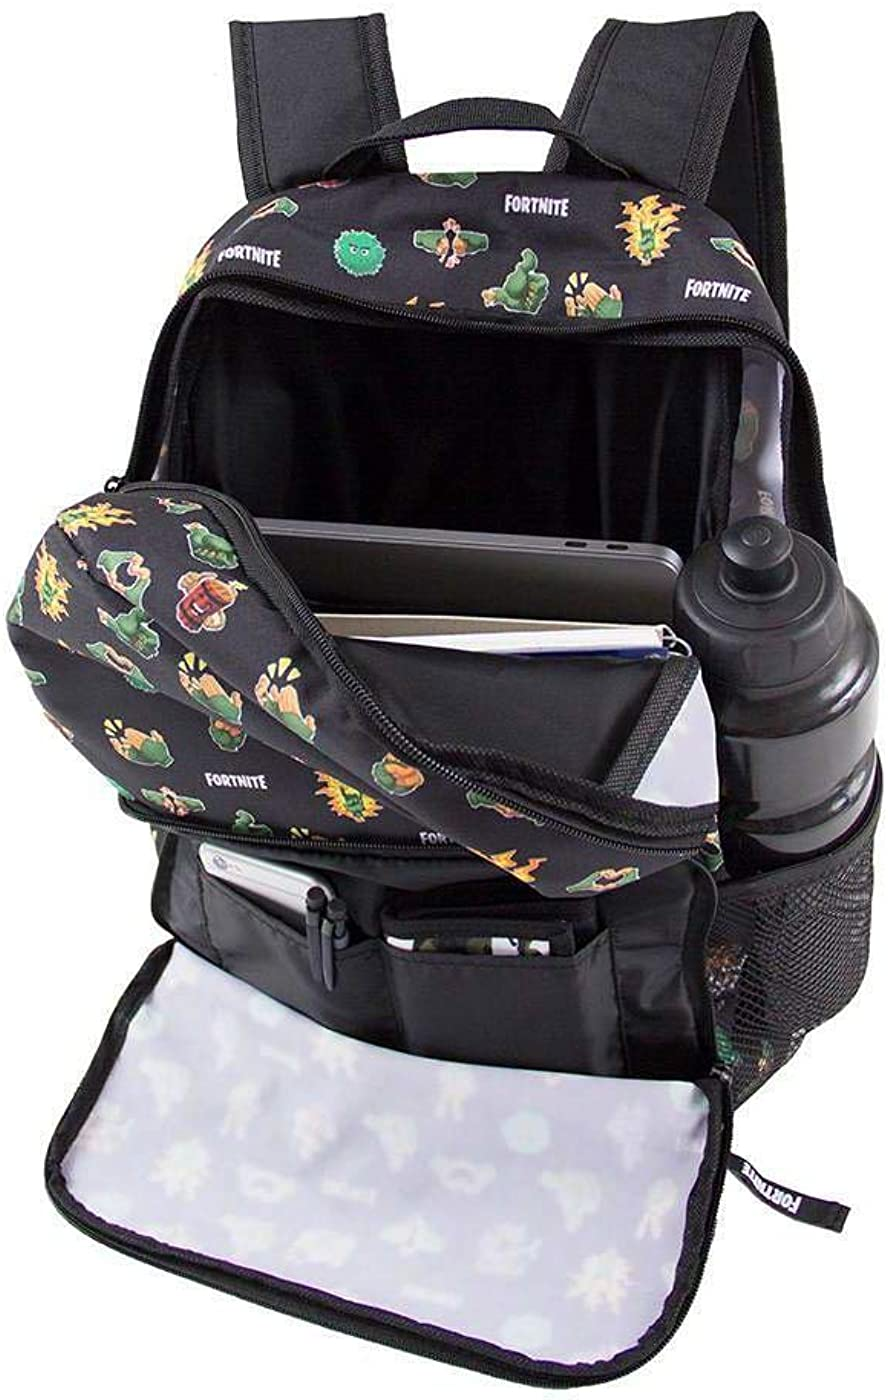 Fortnite Kids Amplify Backpack